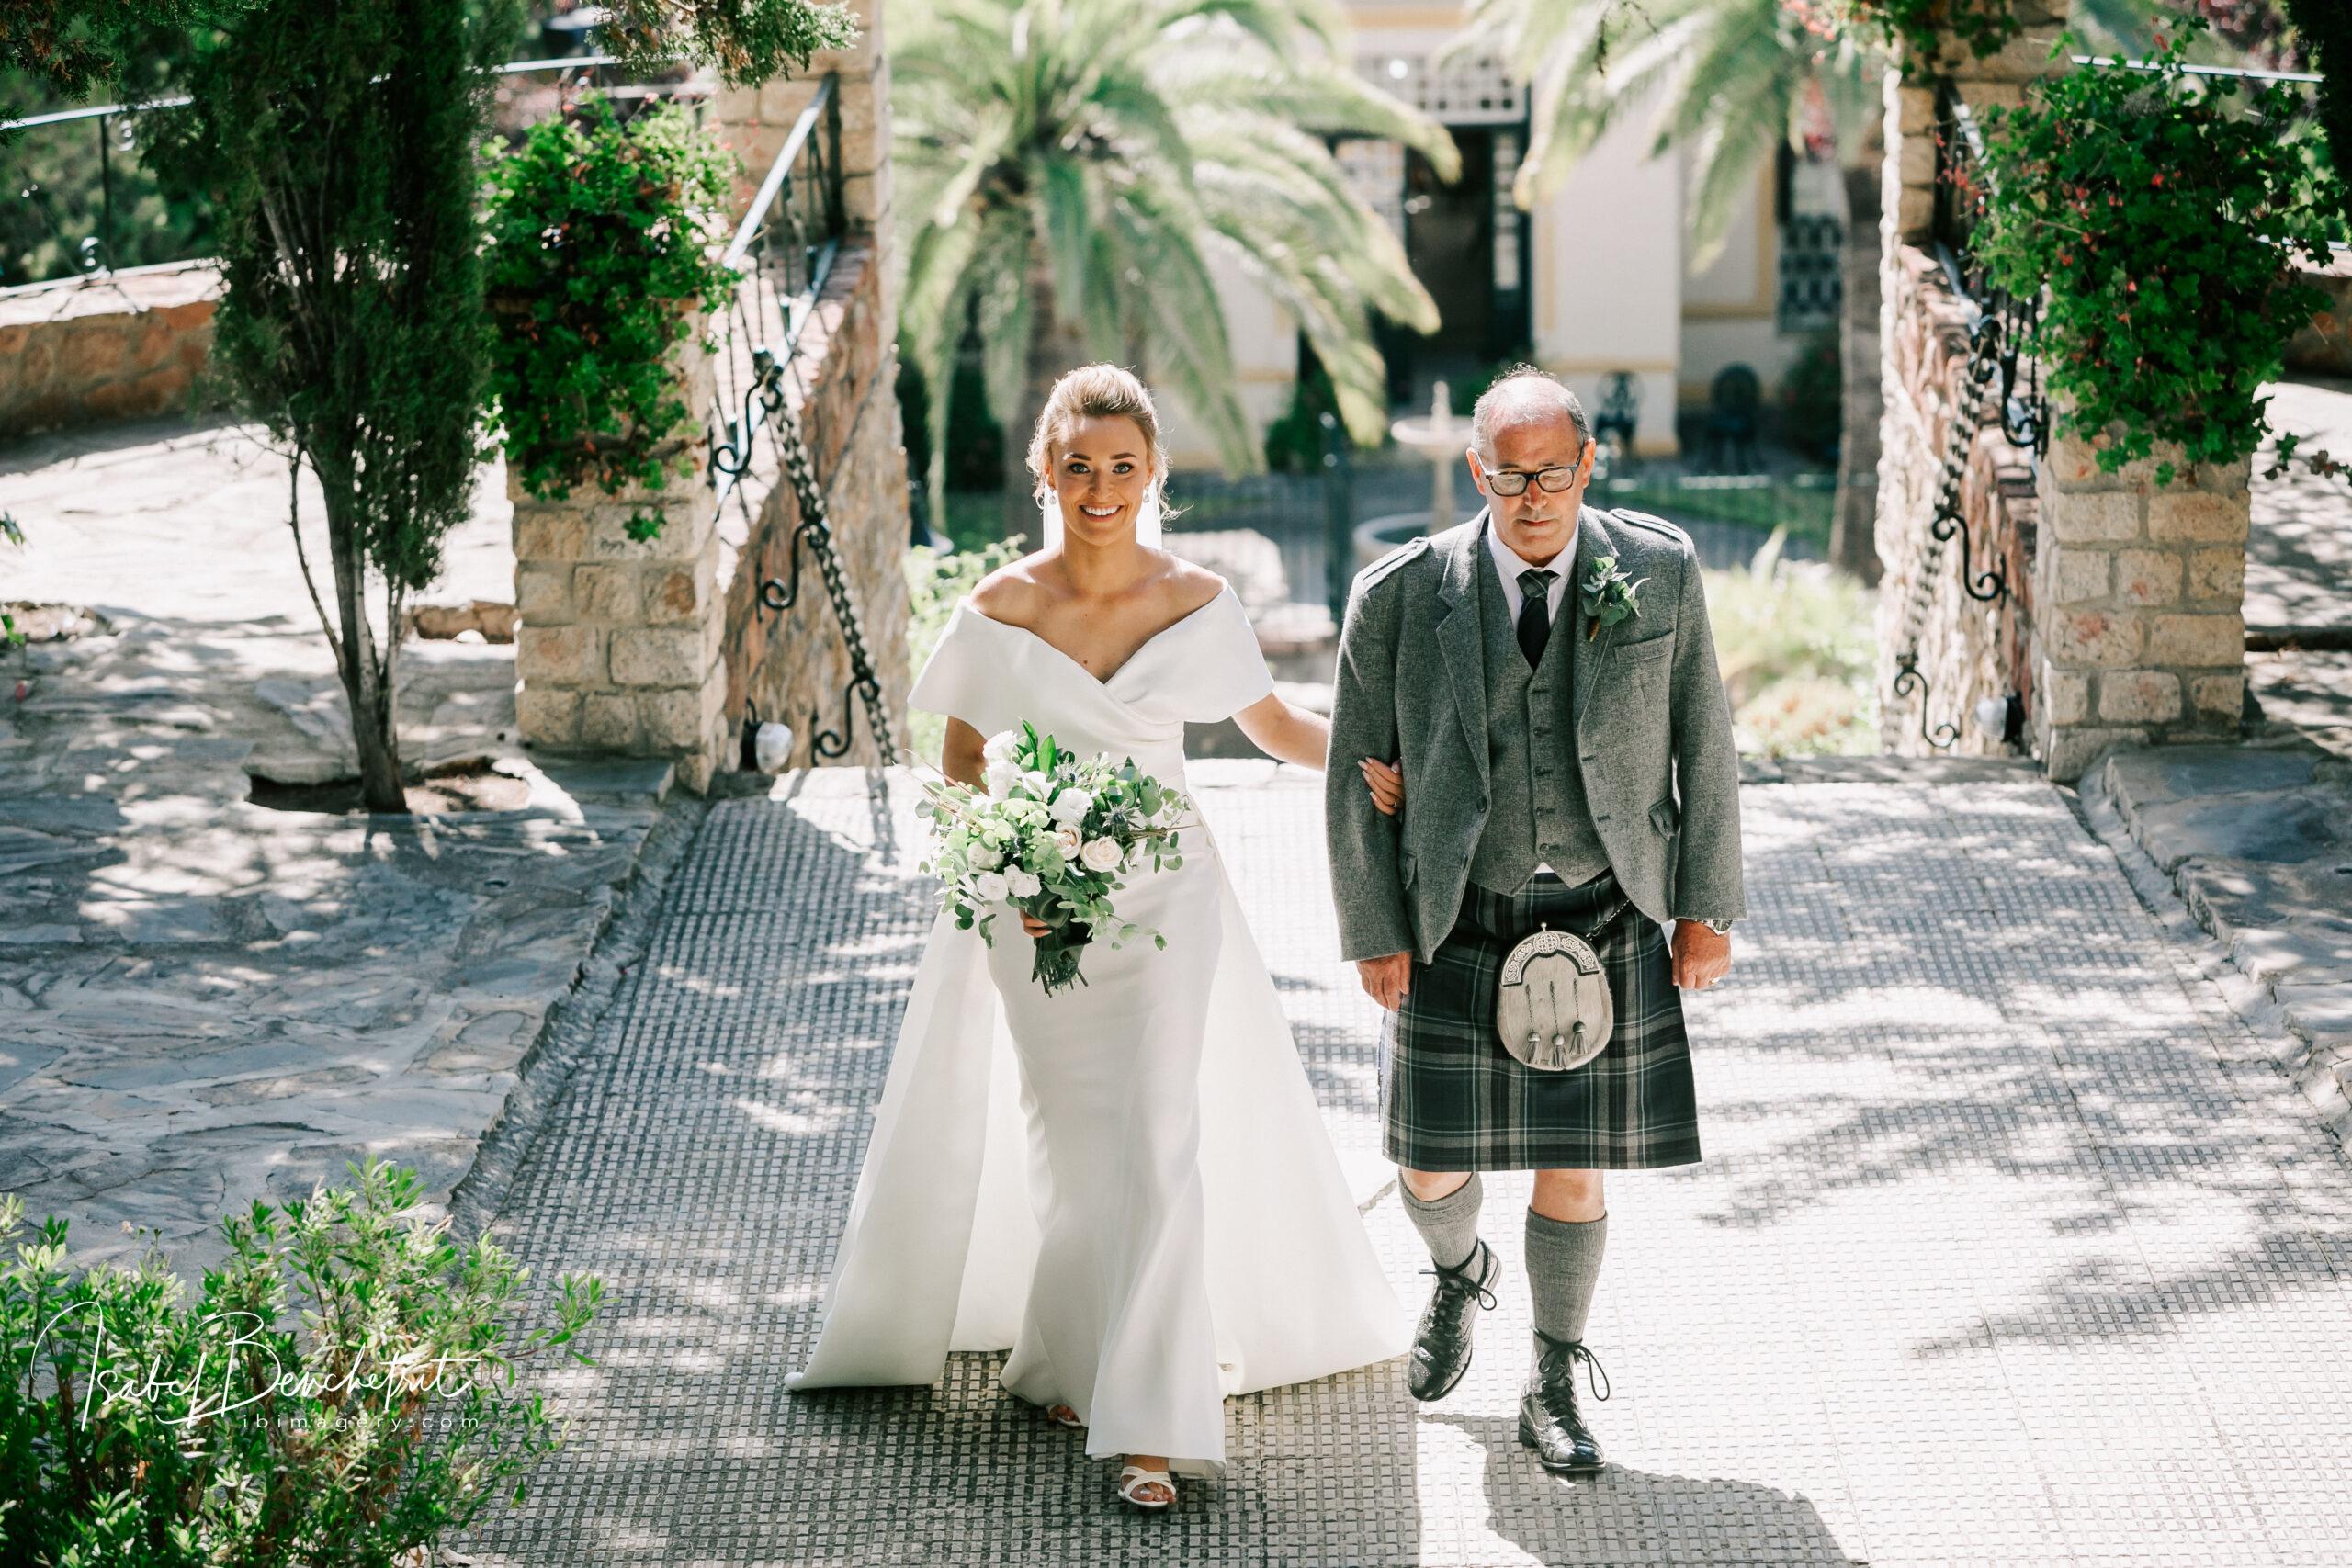 Lesa & Dean, Stylish Spanish Wedding